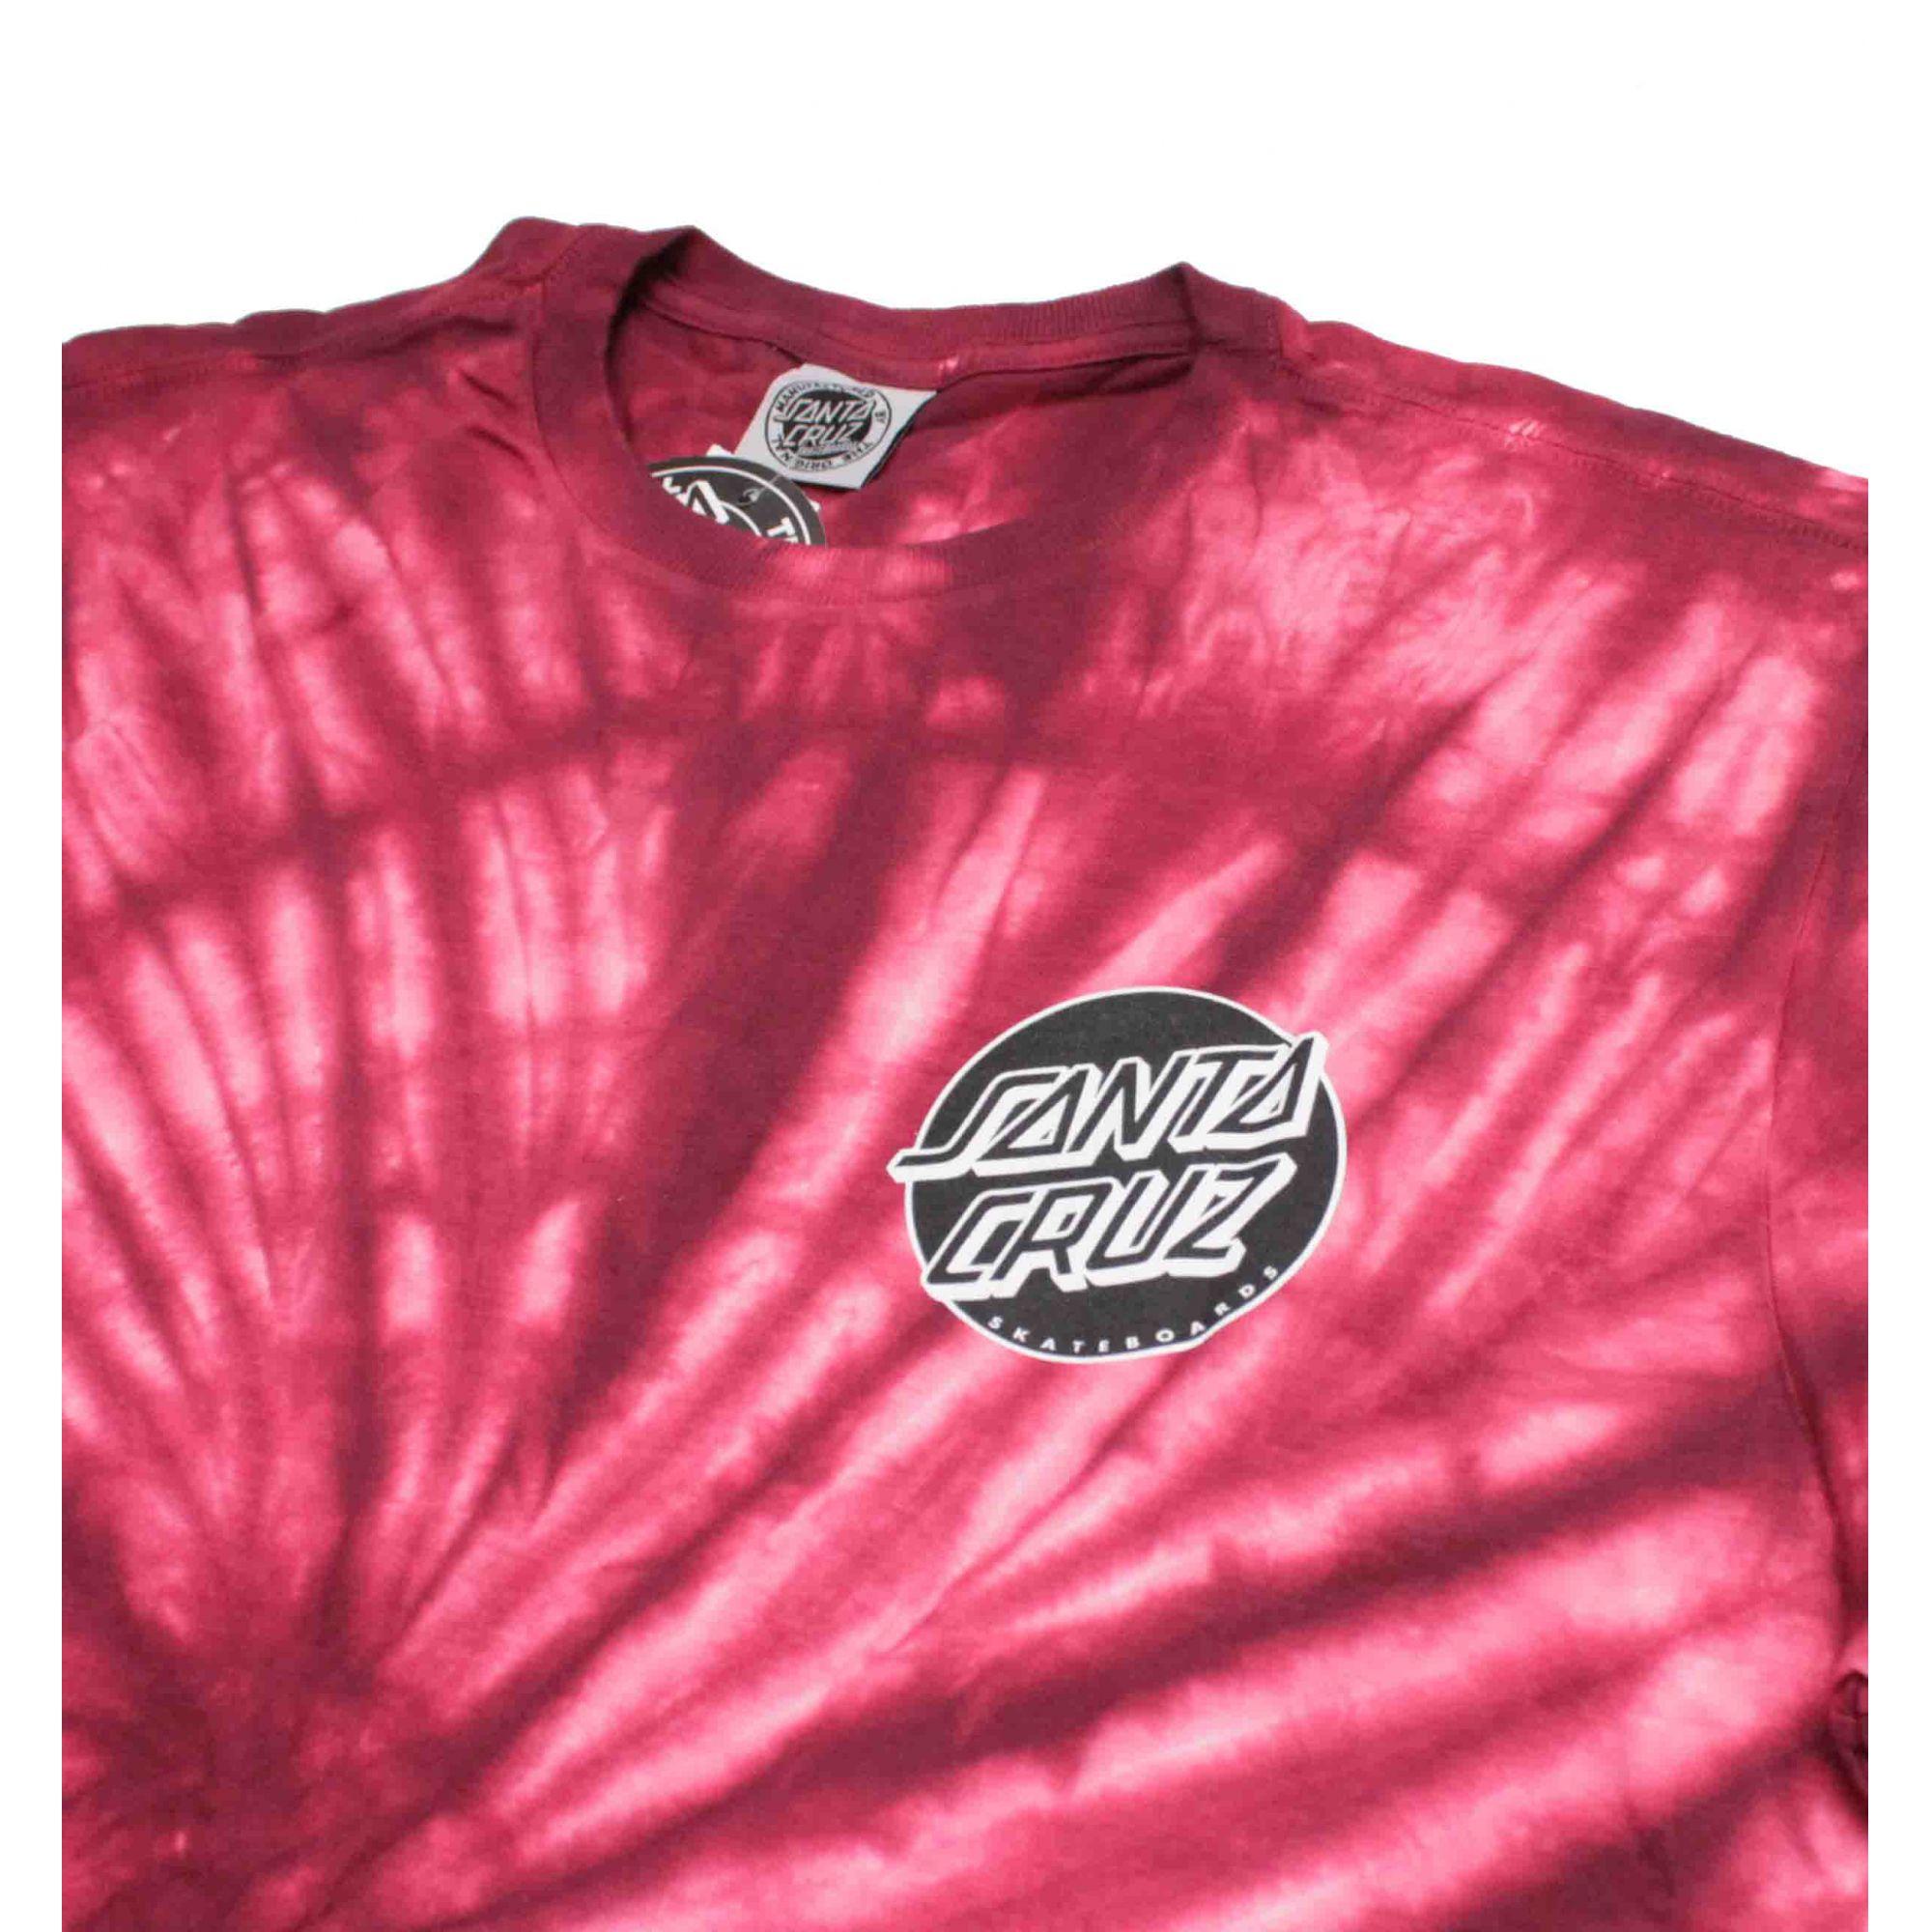 Camiseta Santa Cruz Conjurer Tie Dye Red